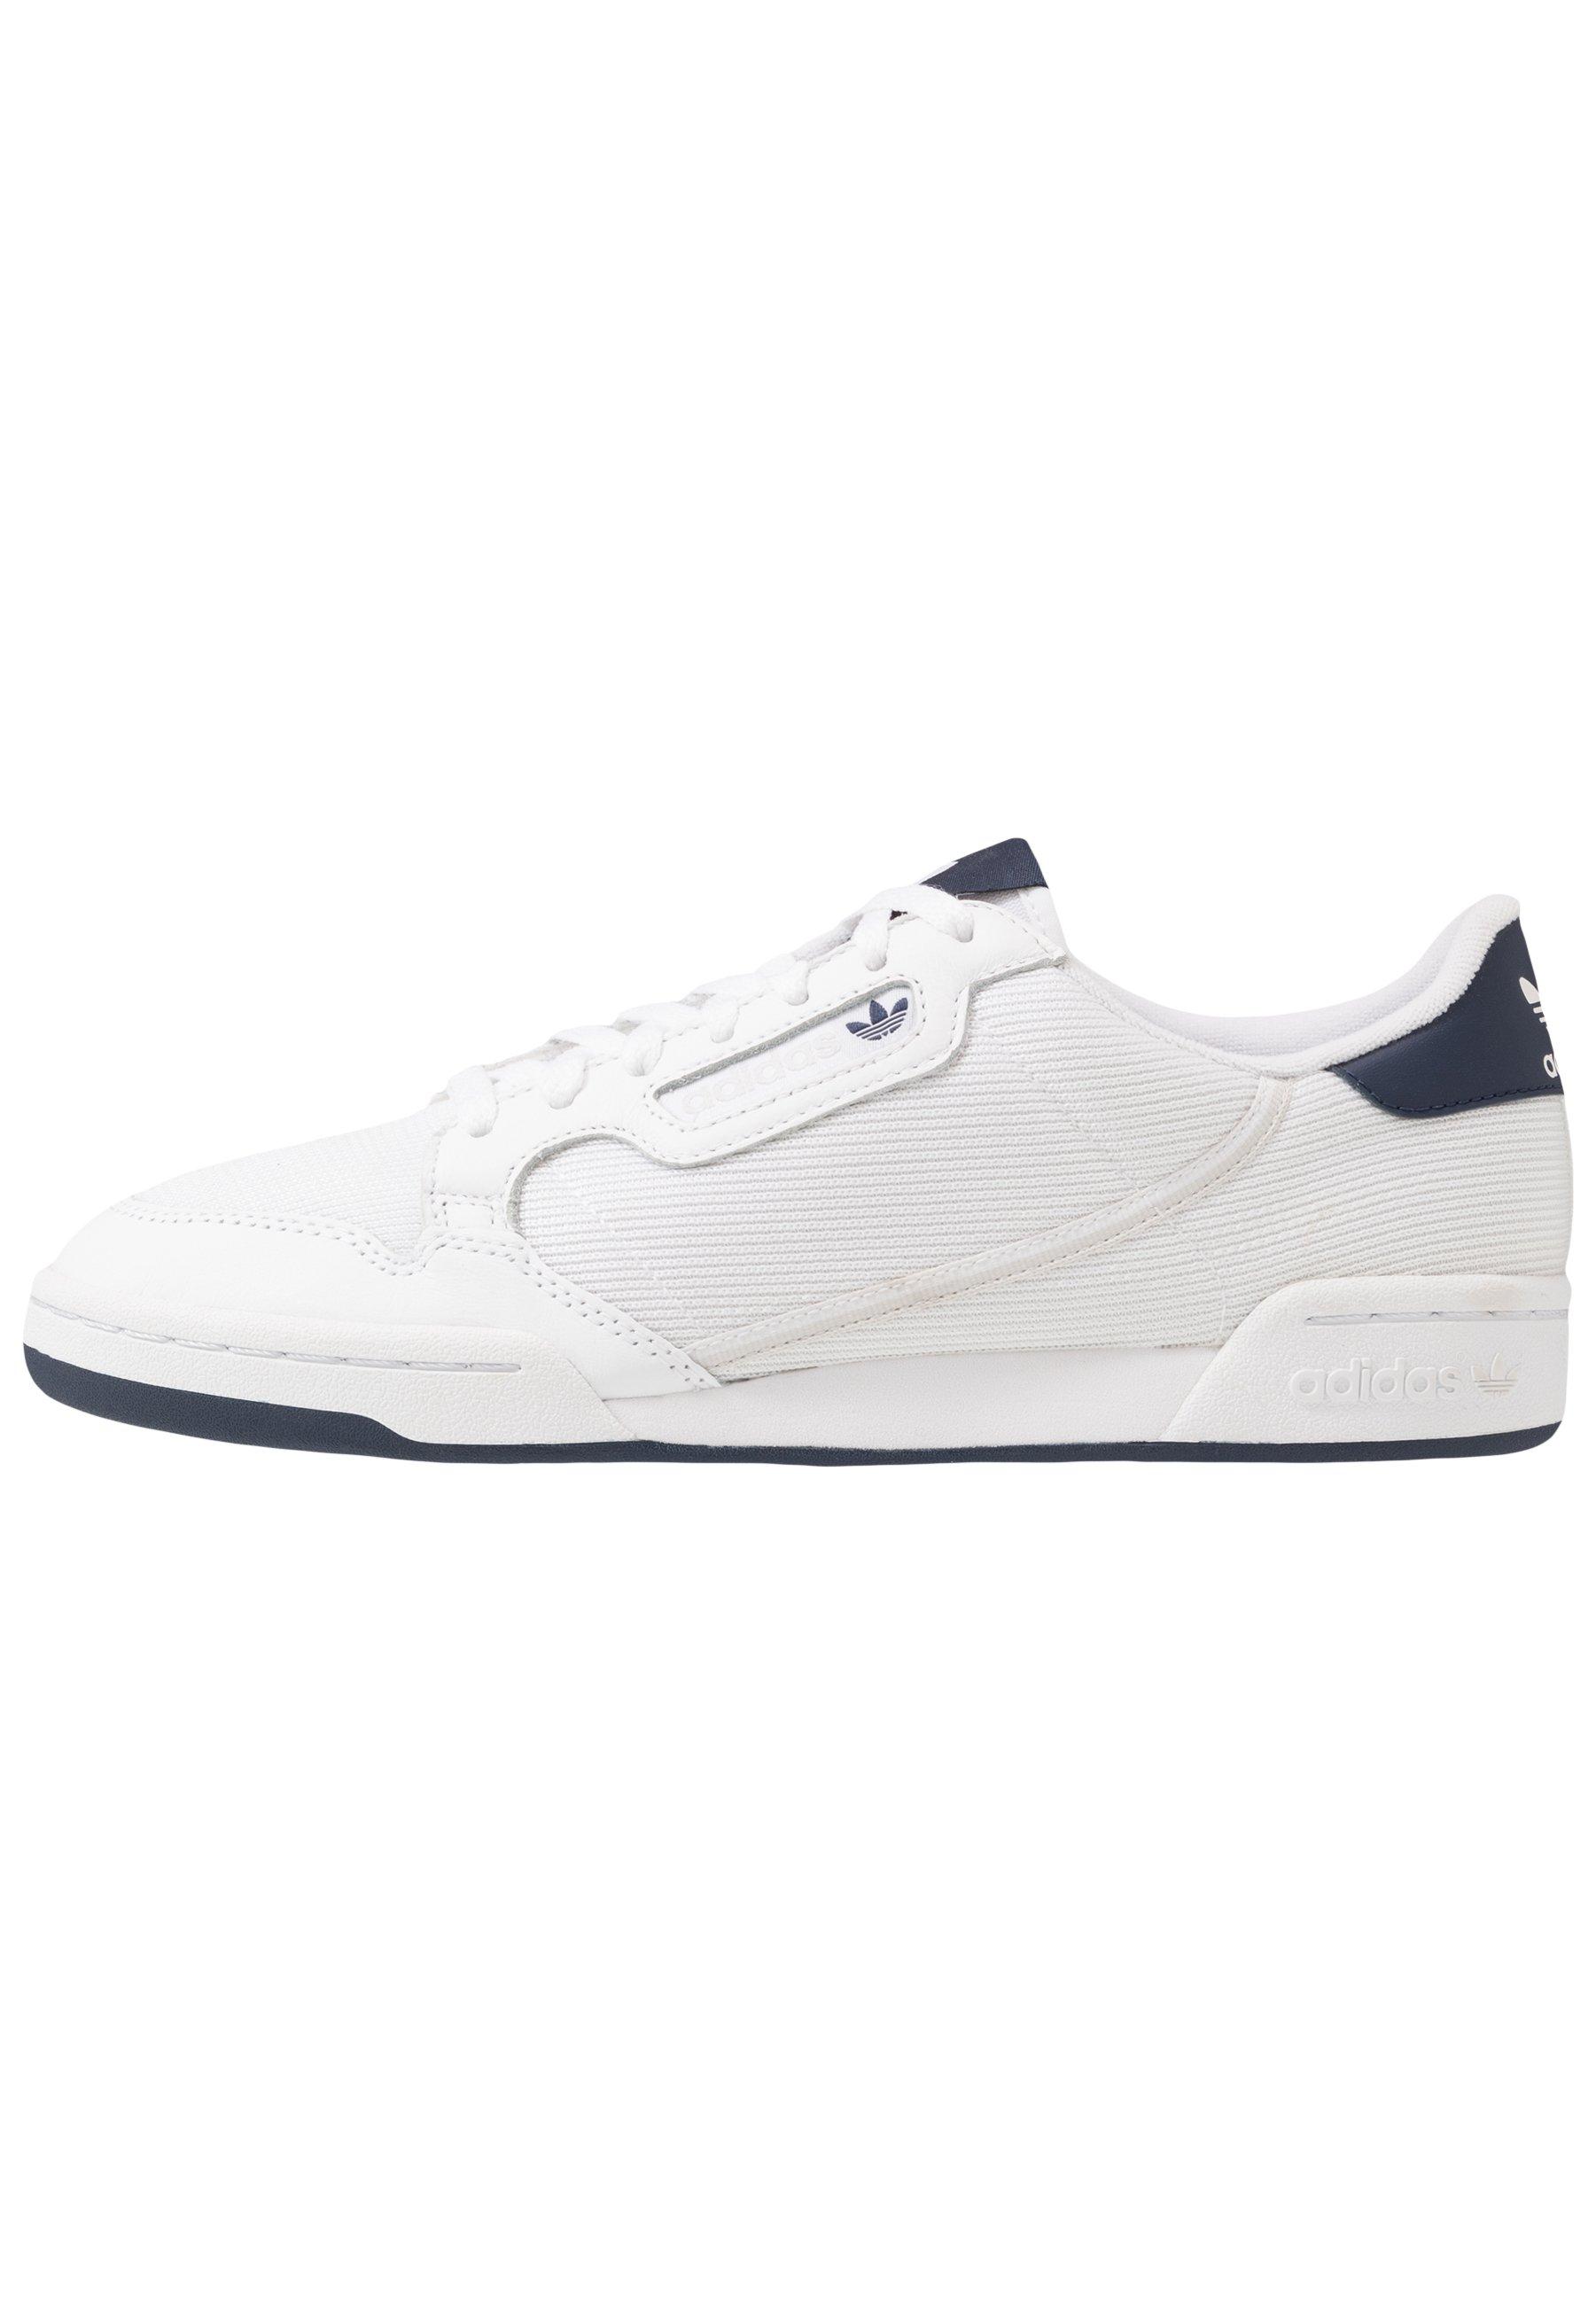 adidas Originals CONTINENTAL 80 Sneakers basse footwear